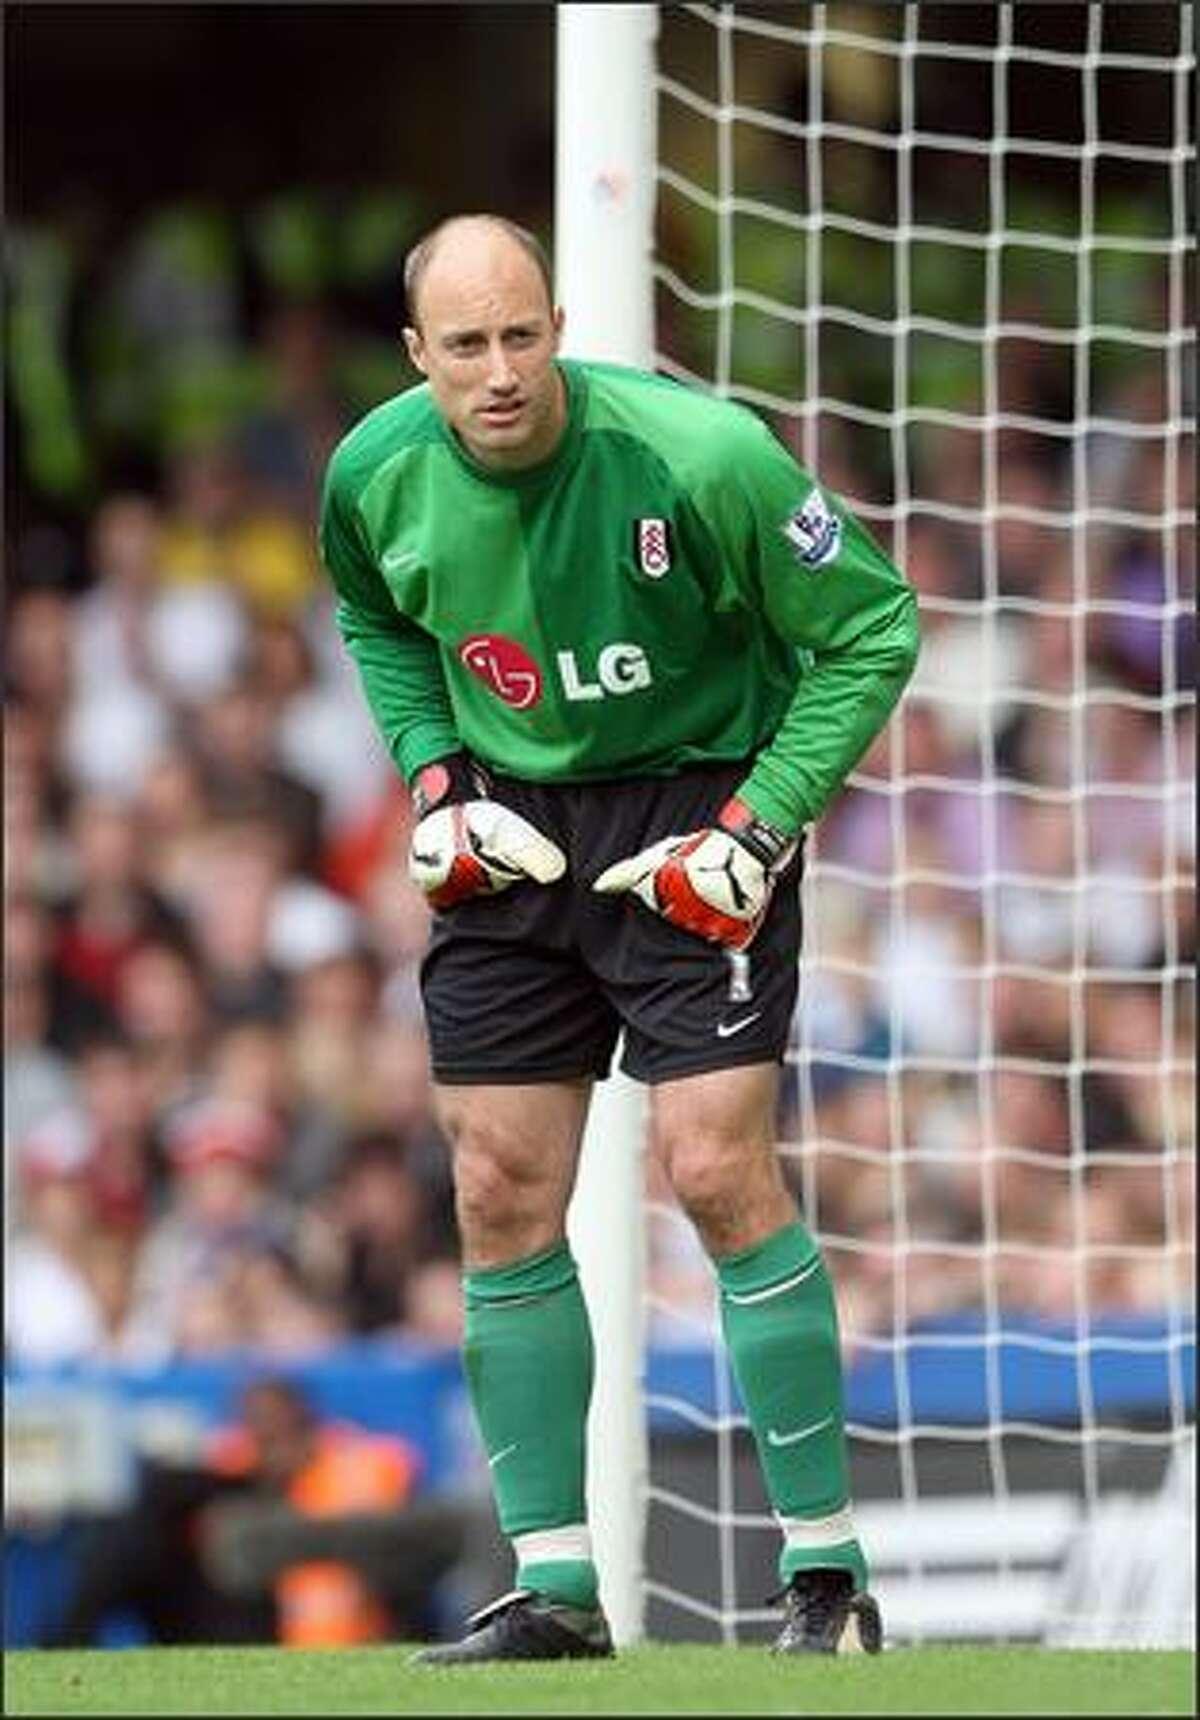 Kasey Keller mans the net for Fulham in a Premier League match against Chelsea at Stamford Bridge.